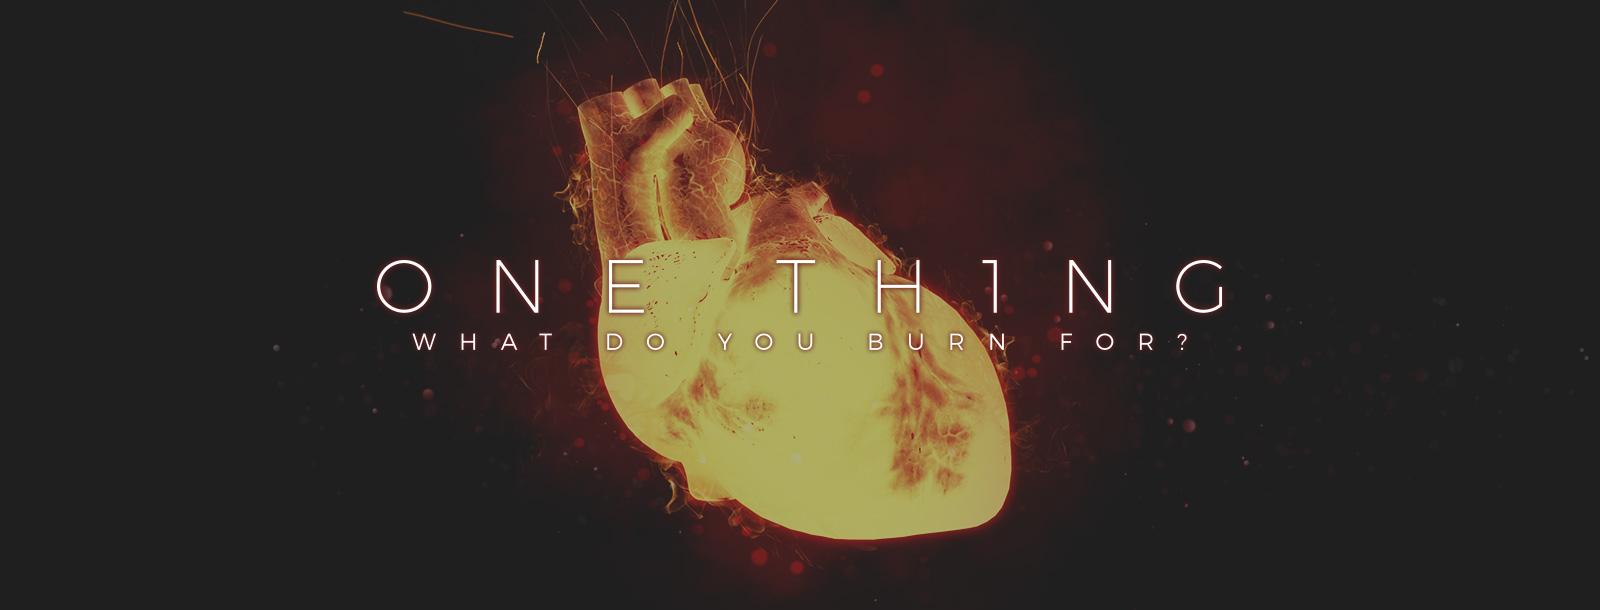 3:16 Church - One Thing